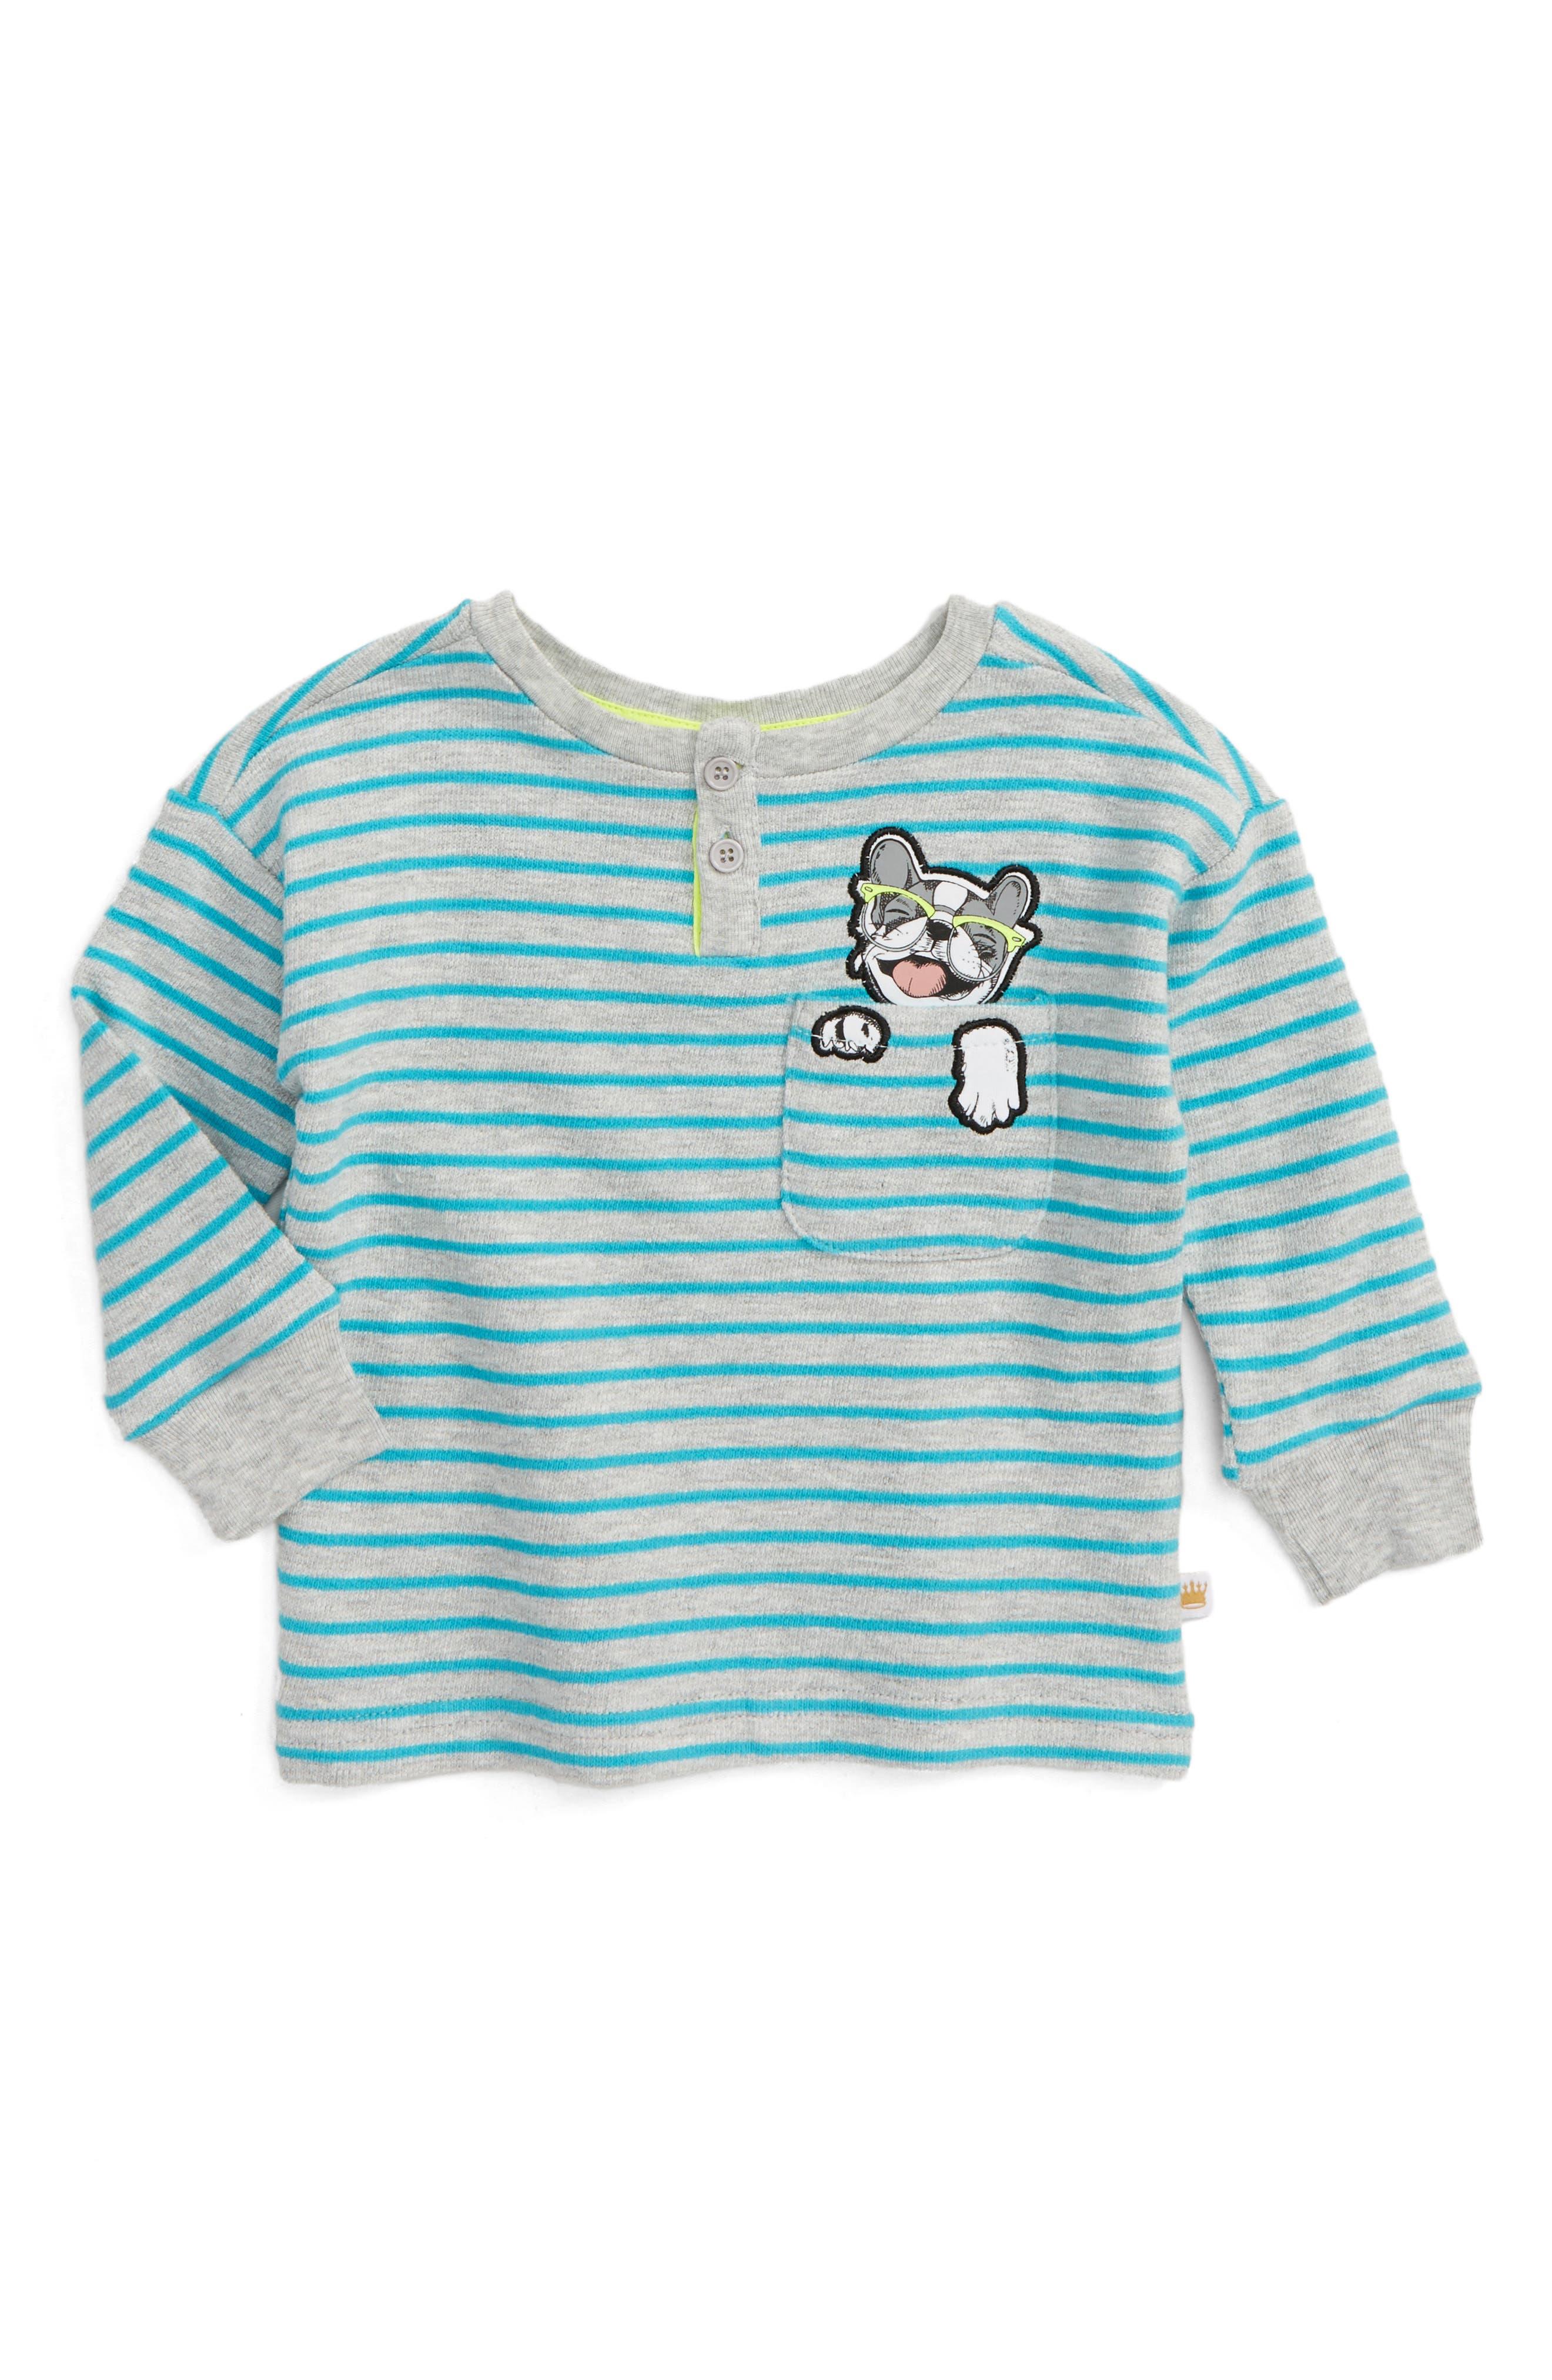 Rosie Pope Pocket Pup Appliqué Stripe Shirt (Baby Boys)